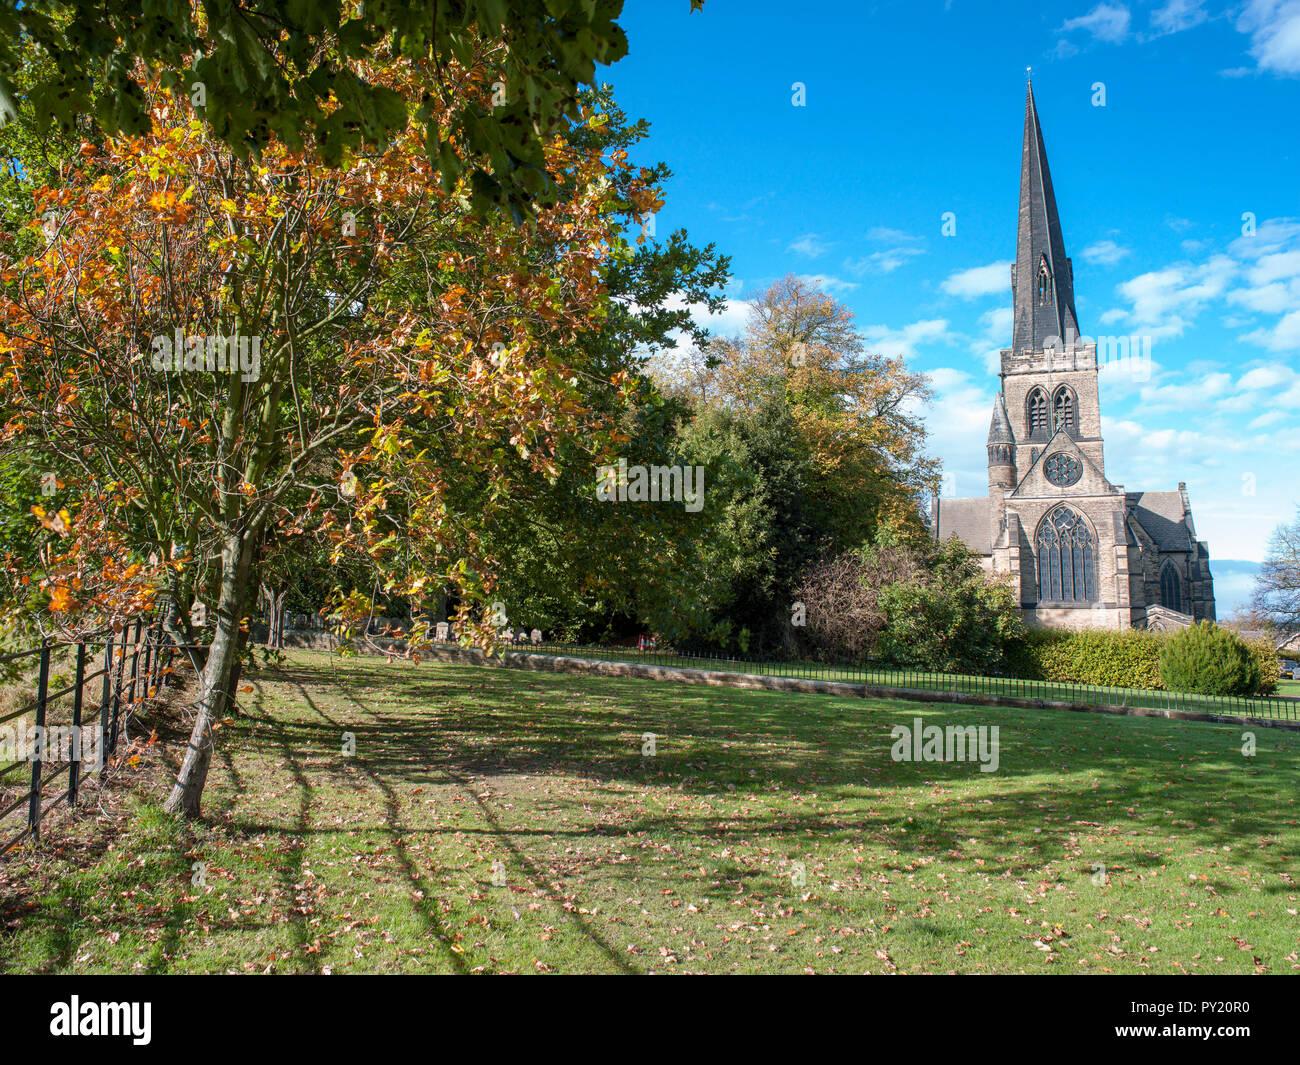 Holy Trinity Parish Church Wentworth, south yorkshire, England in the autumn sunshine - Stock Image